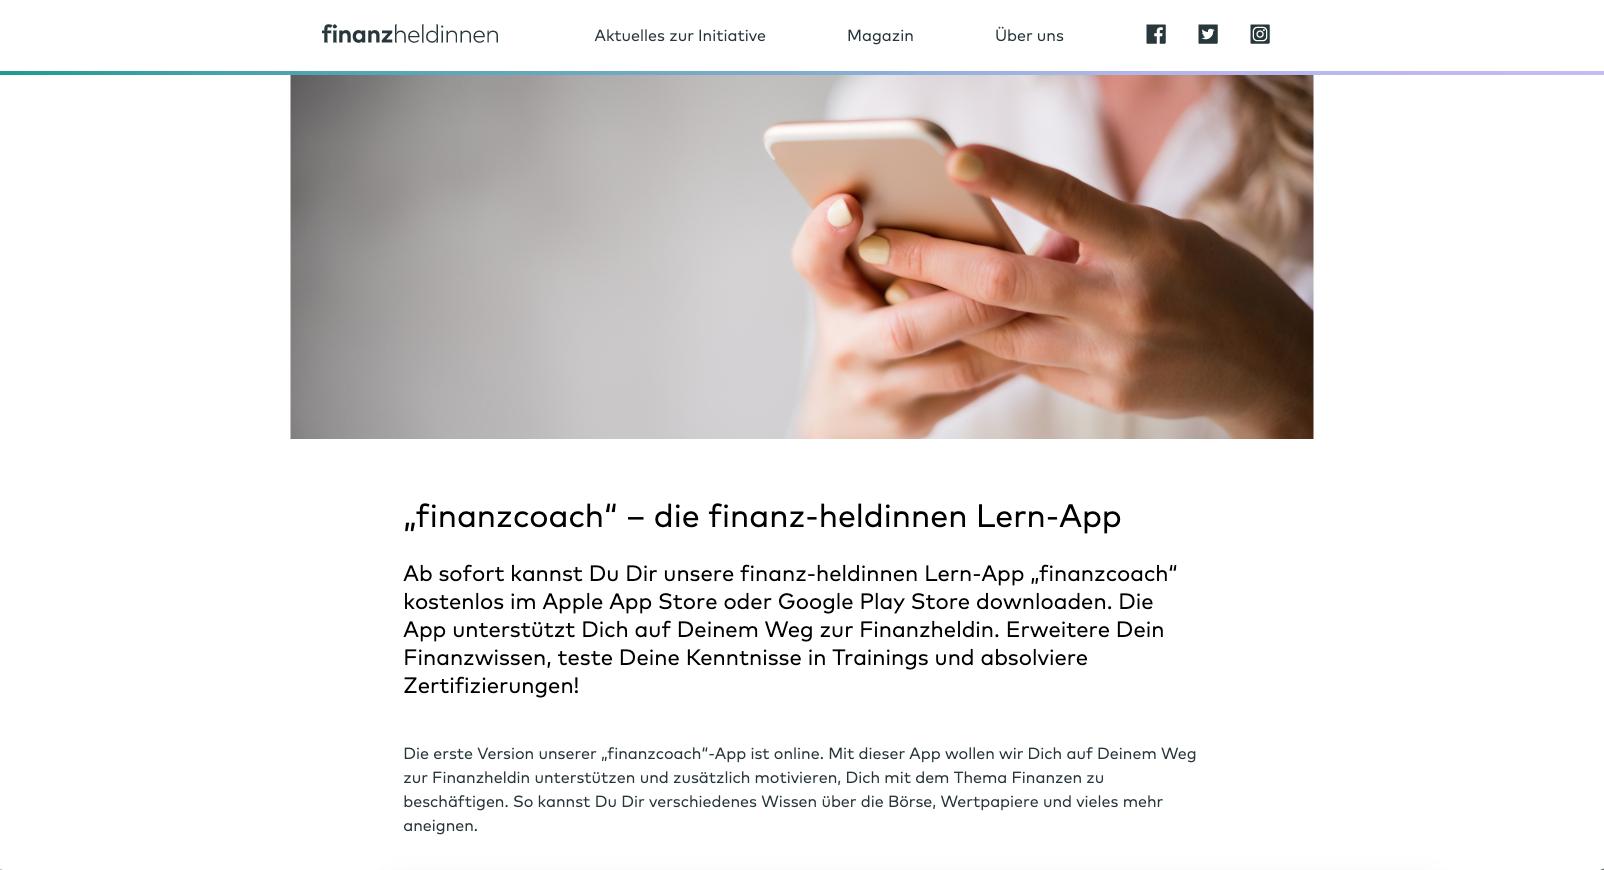 6-besten-finanz-apps-5.png